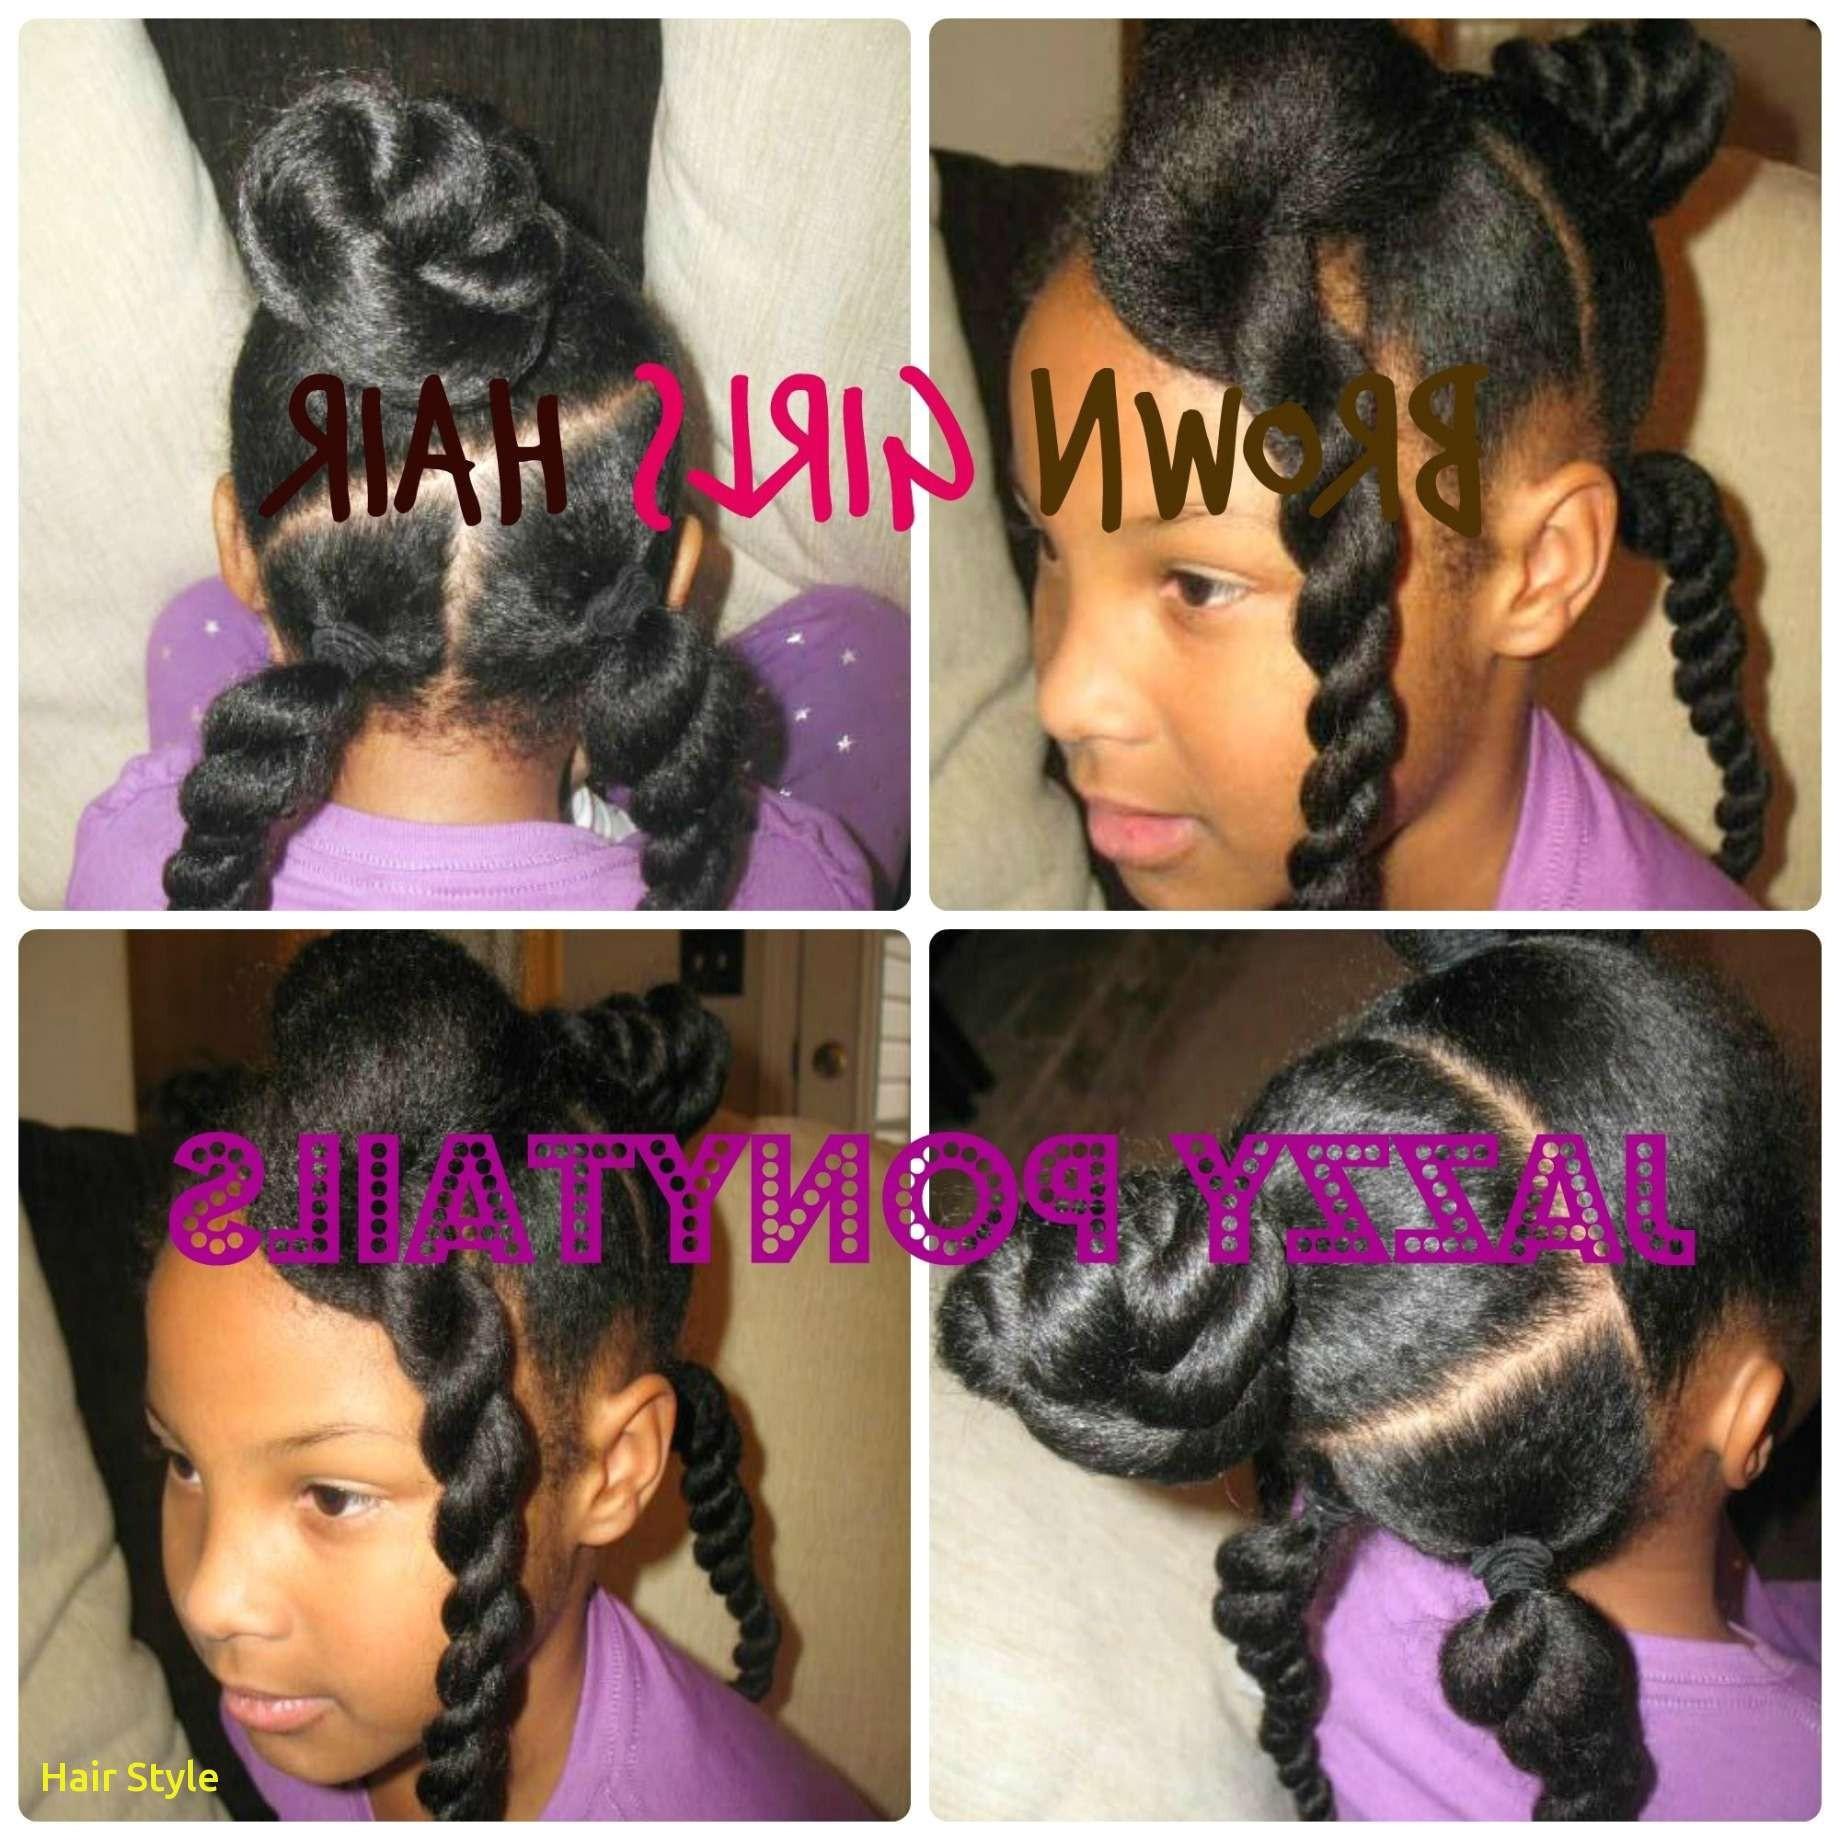 Little Black Girls Ponytail Hairstyles 41 Best Ponytail Hairstyles for Children